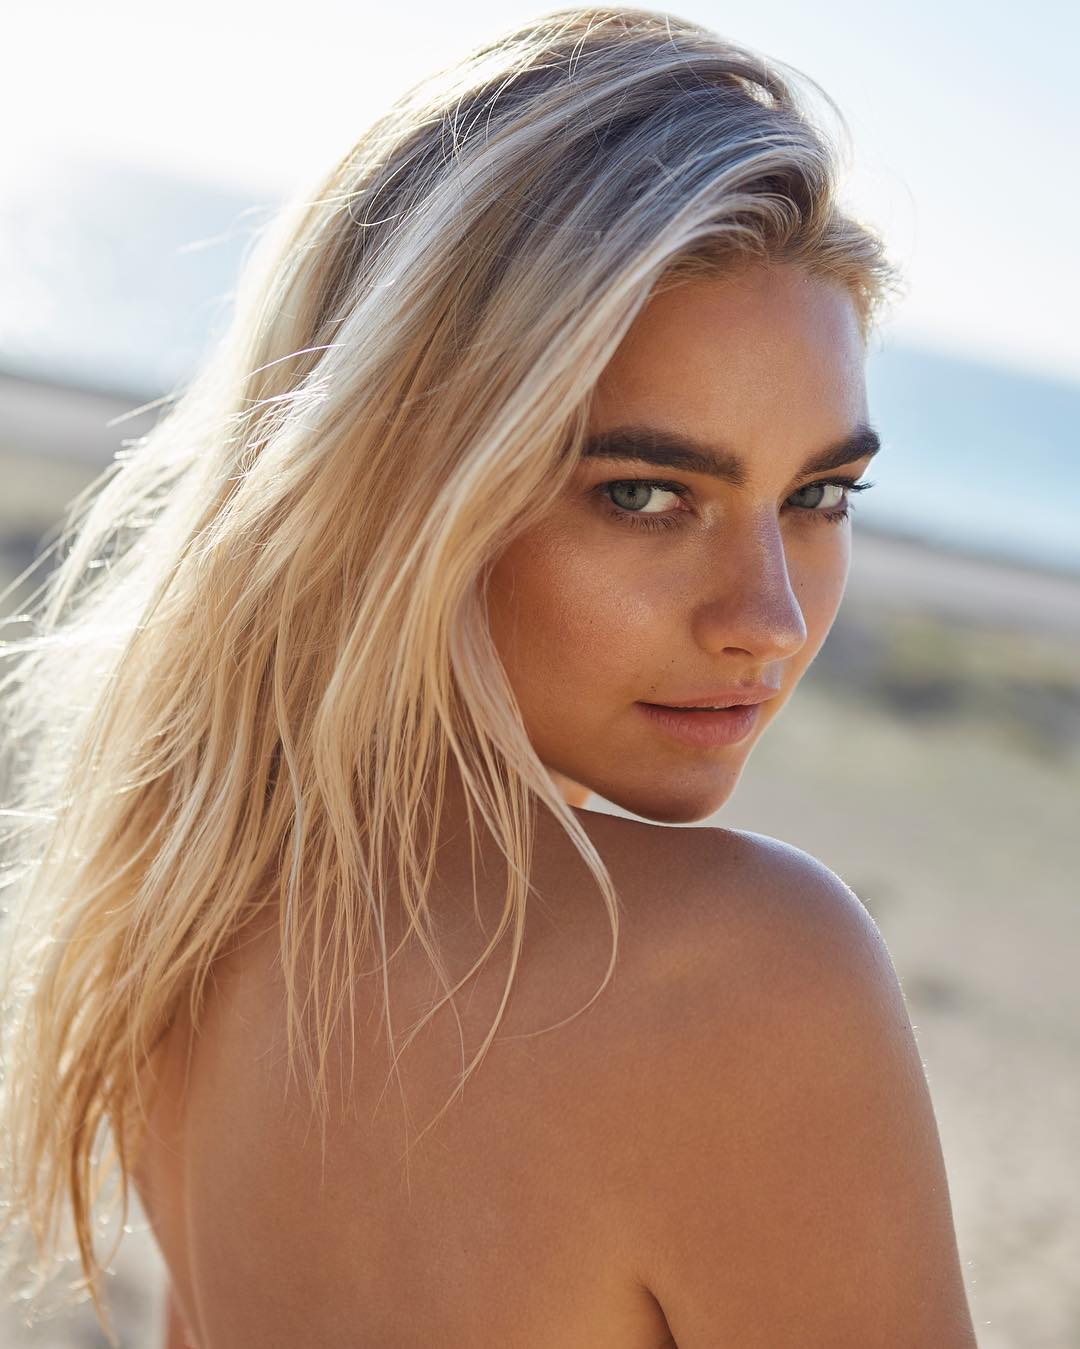 ICloud Tess Jantschek nude (72 photos), Tits, Is a cute, Instagram, cleavage 2006